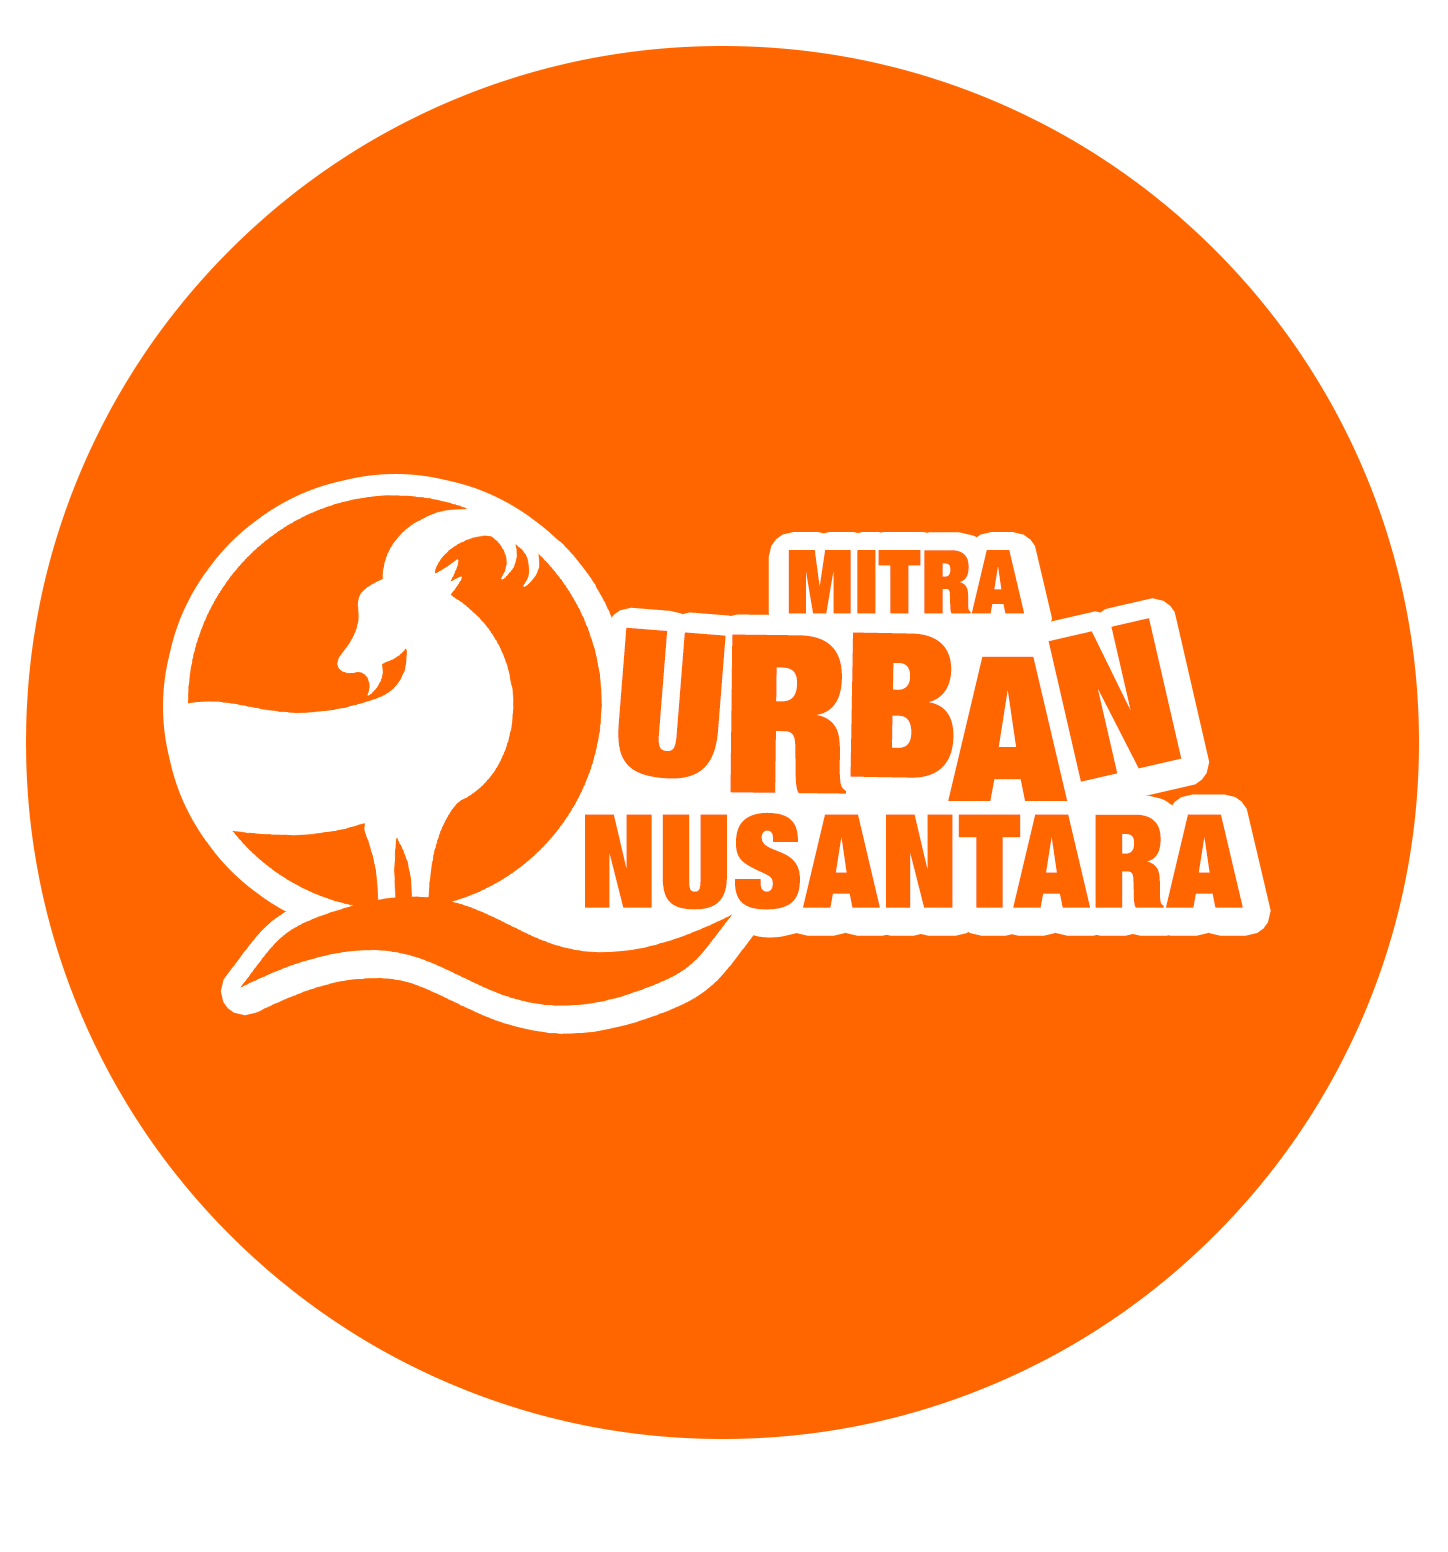 Mitra Qurban Nusantara